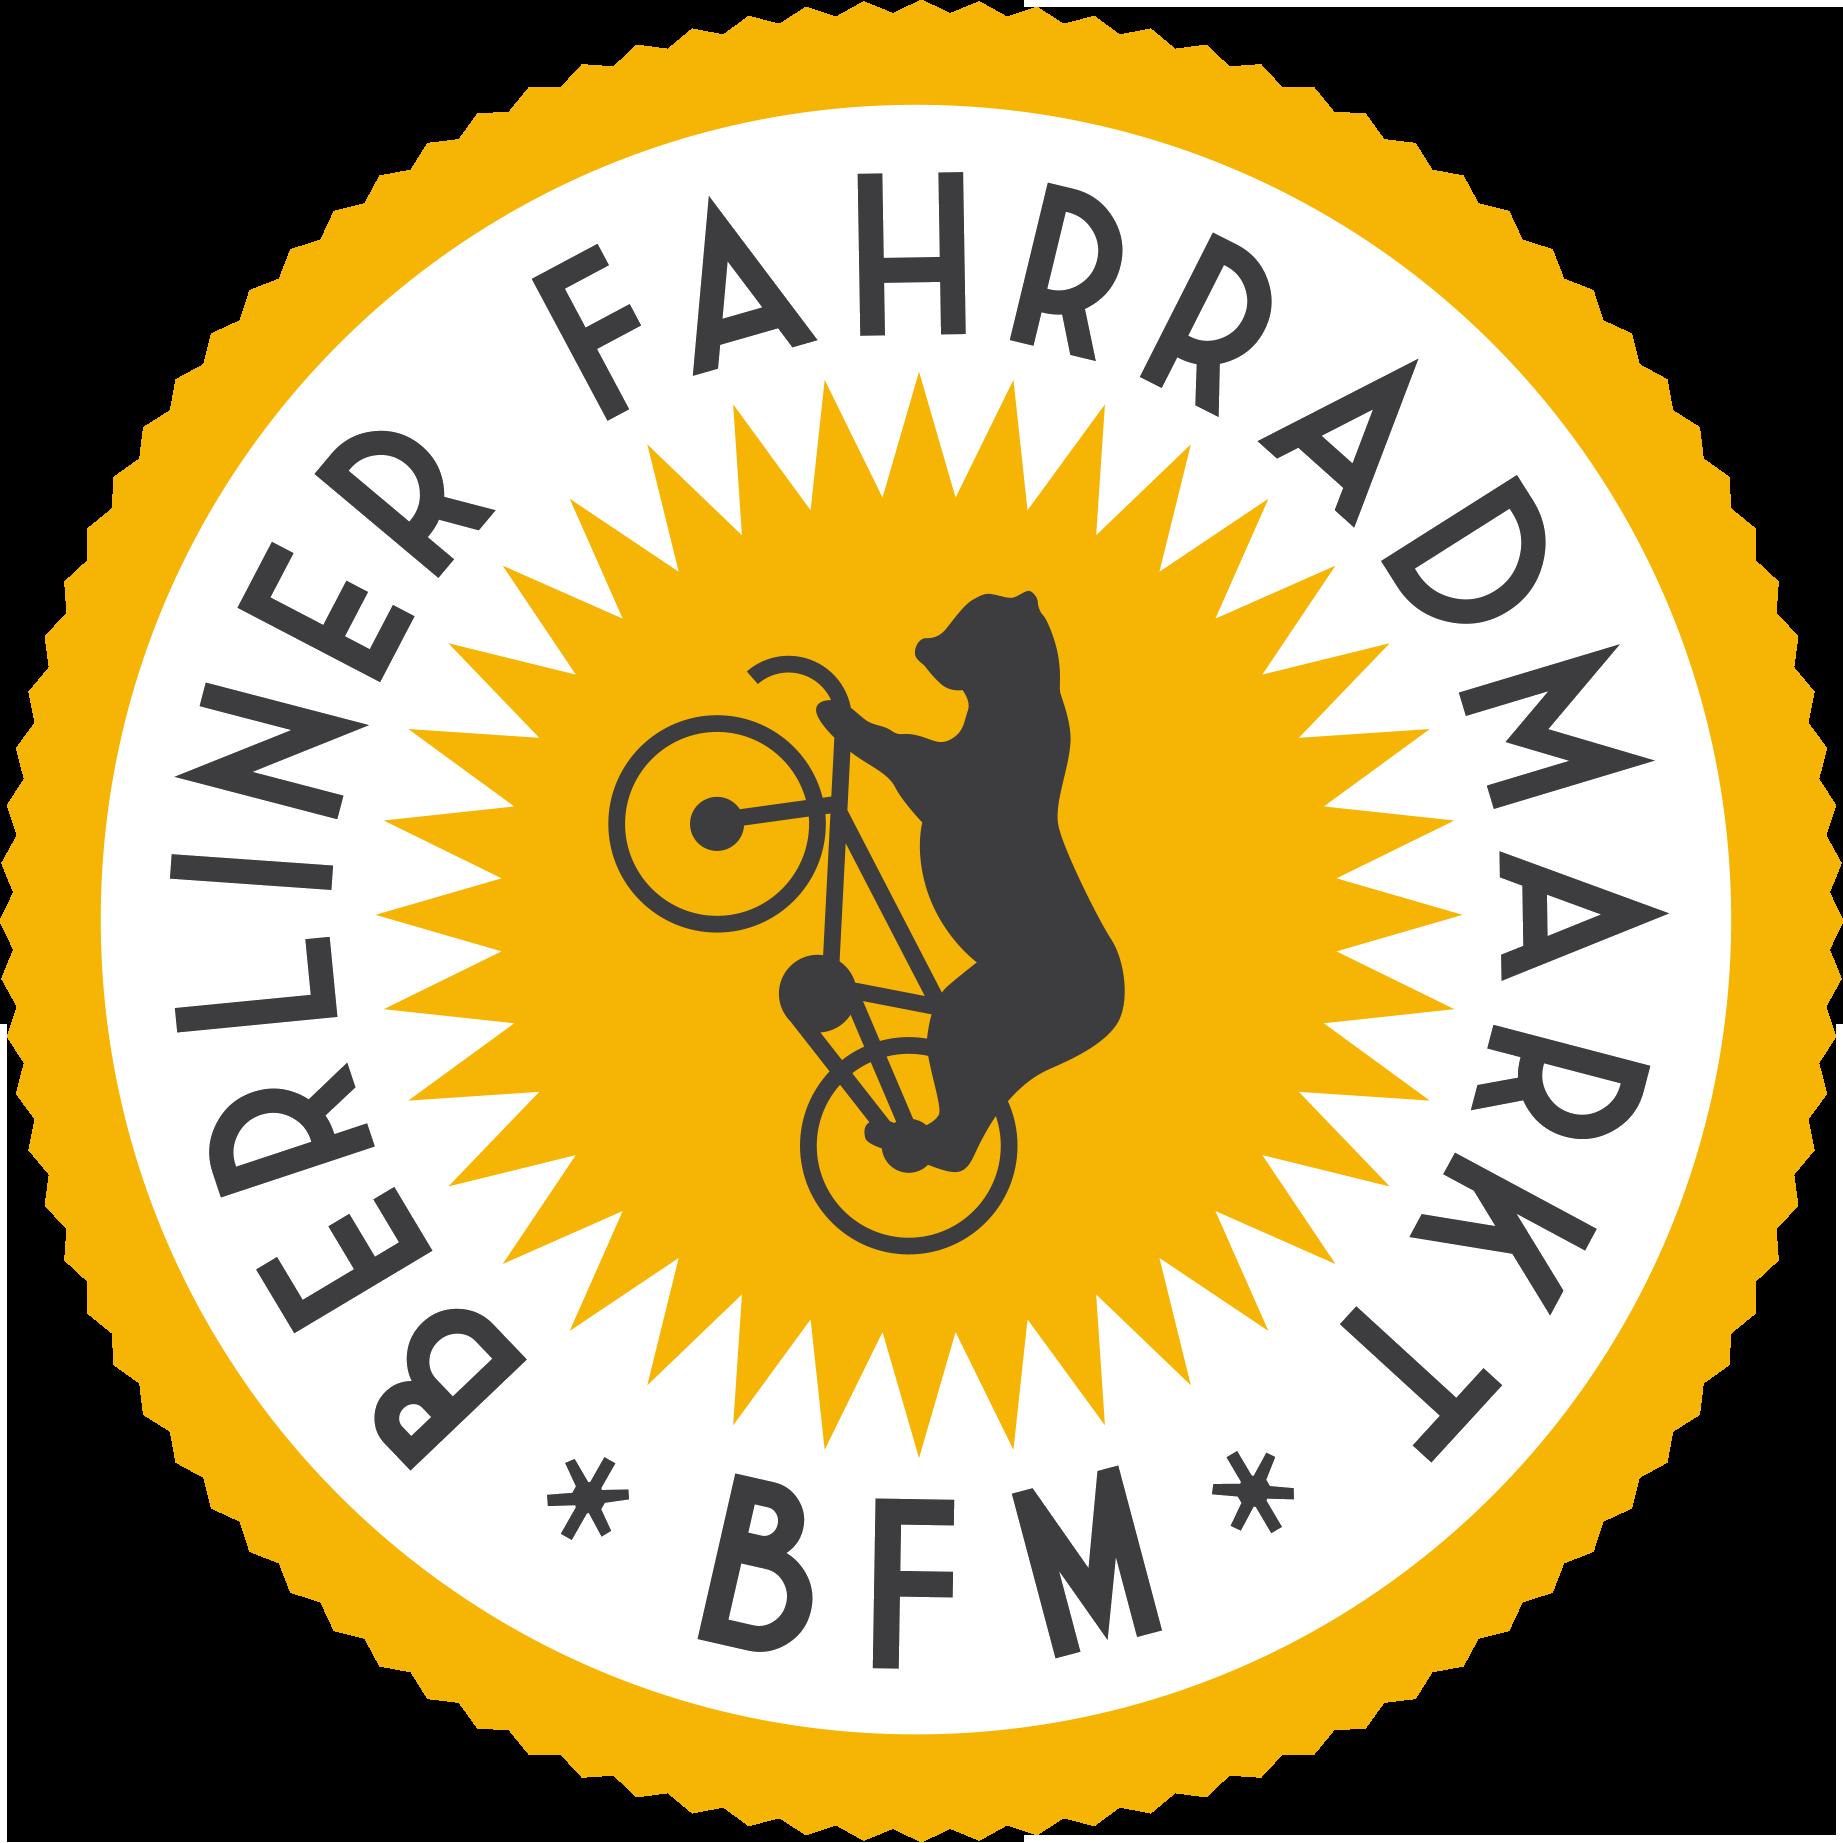 Berliner Fahrradmarkt